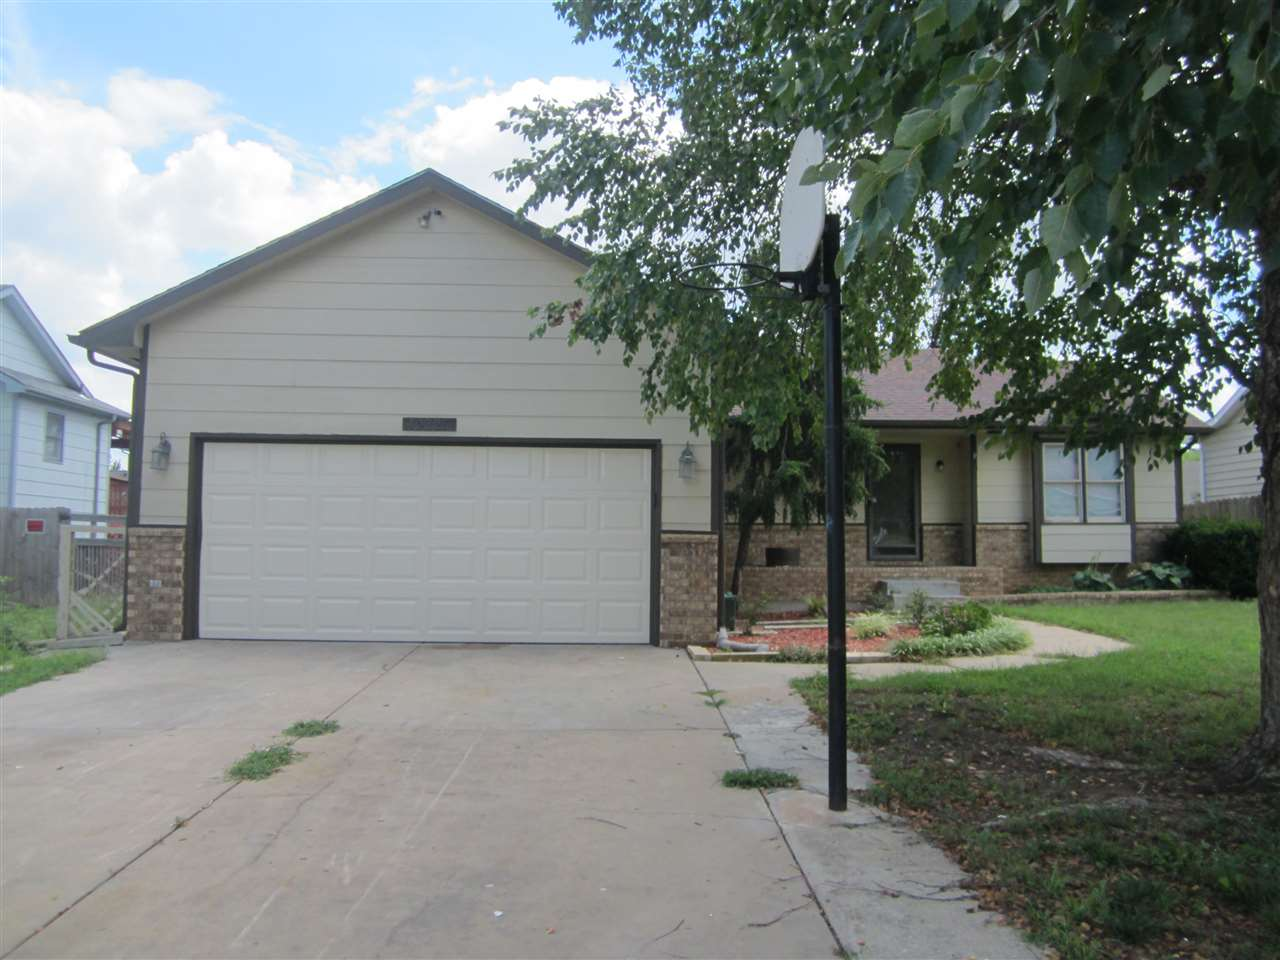 10225 E COUNTRYSIDE CIR, Wichita, KS 67207